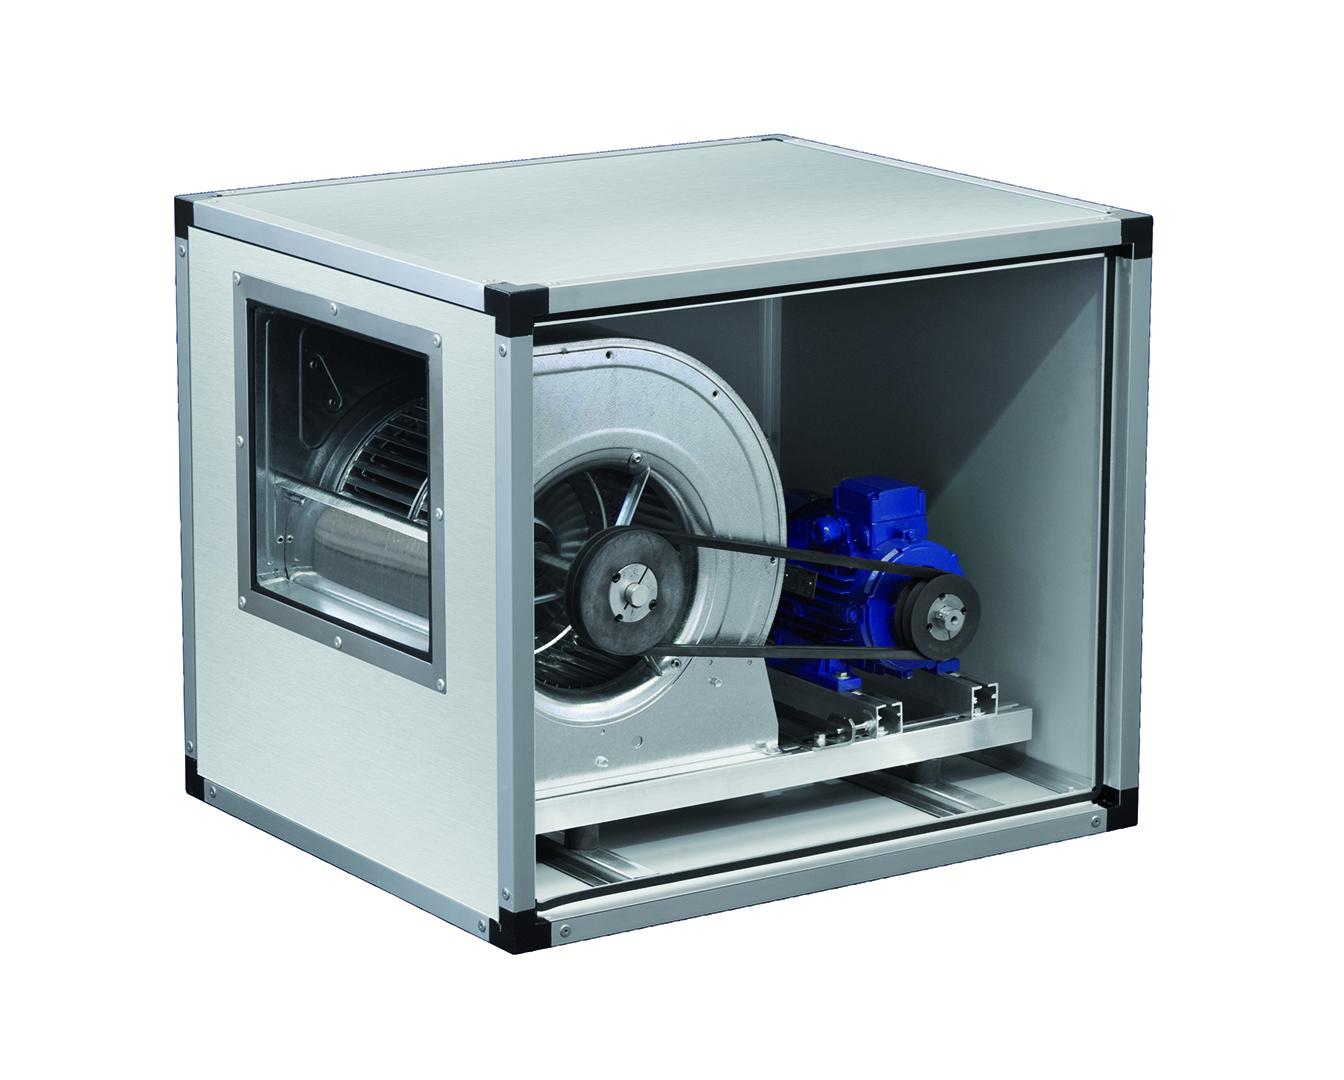 ECT-ventilatore-centrifugo-trifase-trasmissione-una-velocita.jpg